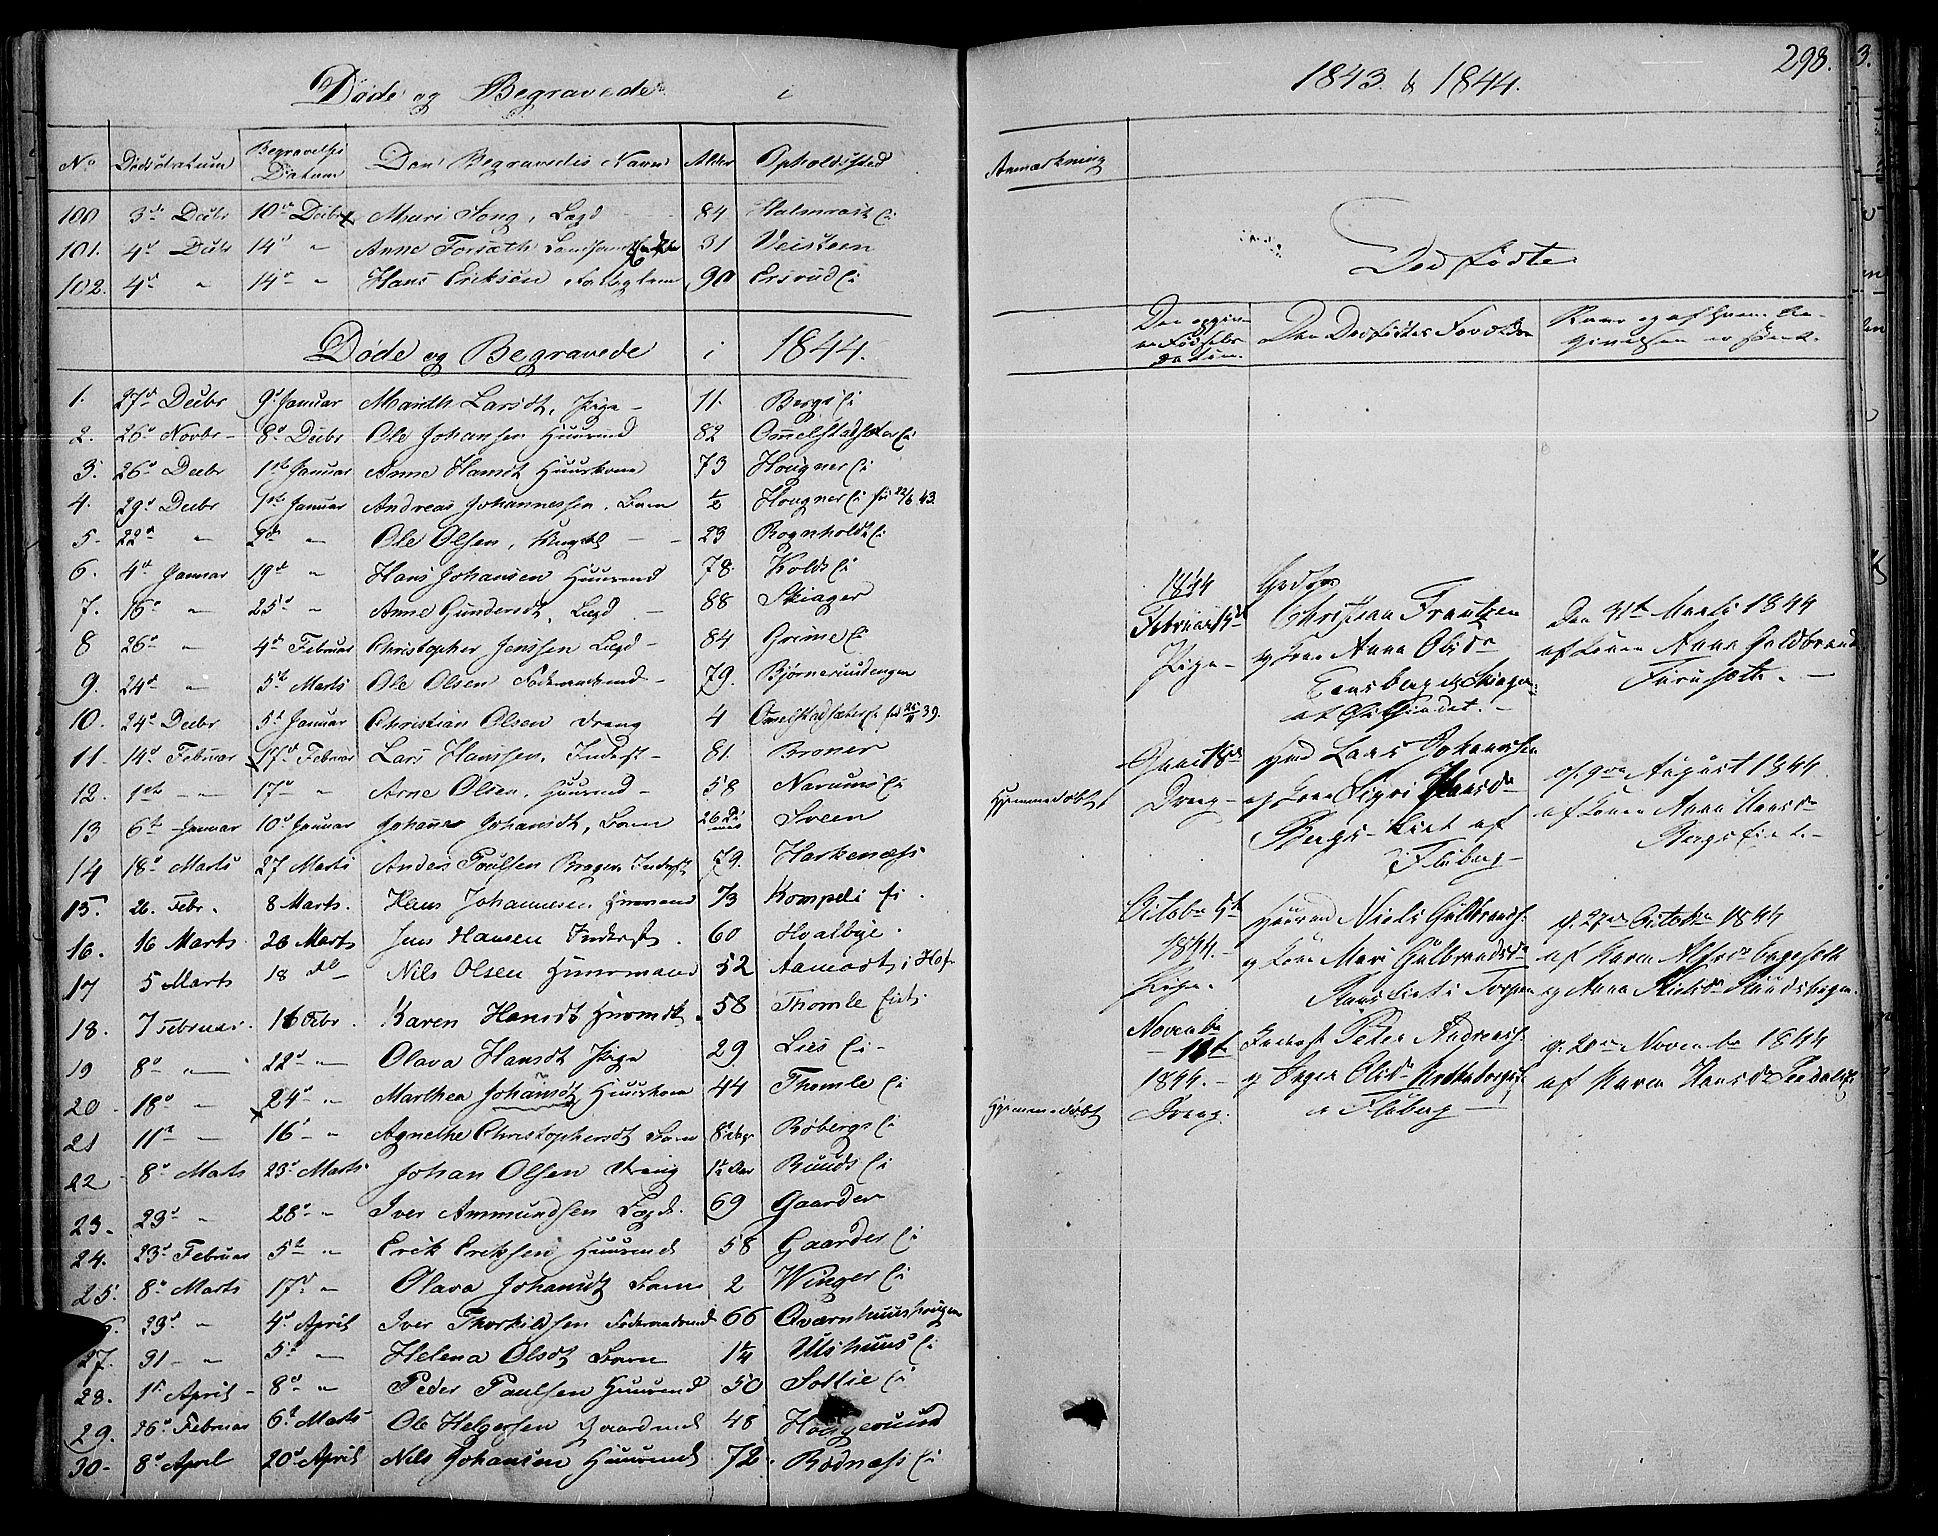 SAH, Land prestekontor, Ministerialbok nr. 8, 1830-1846, s. 298